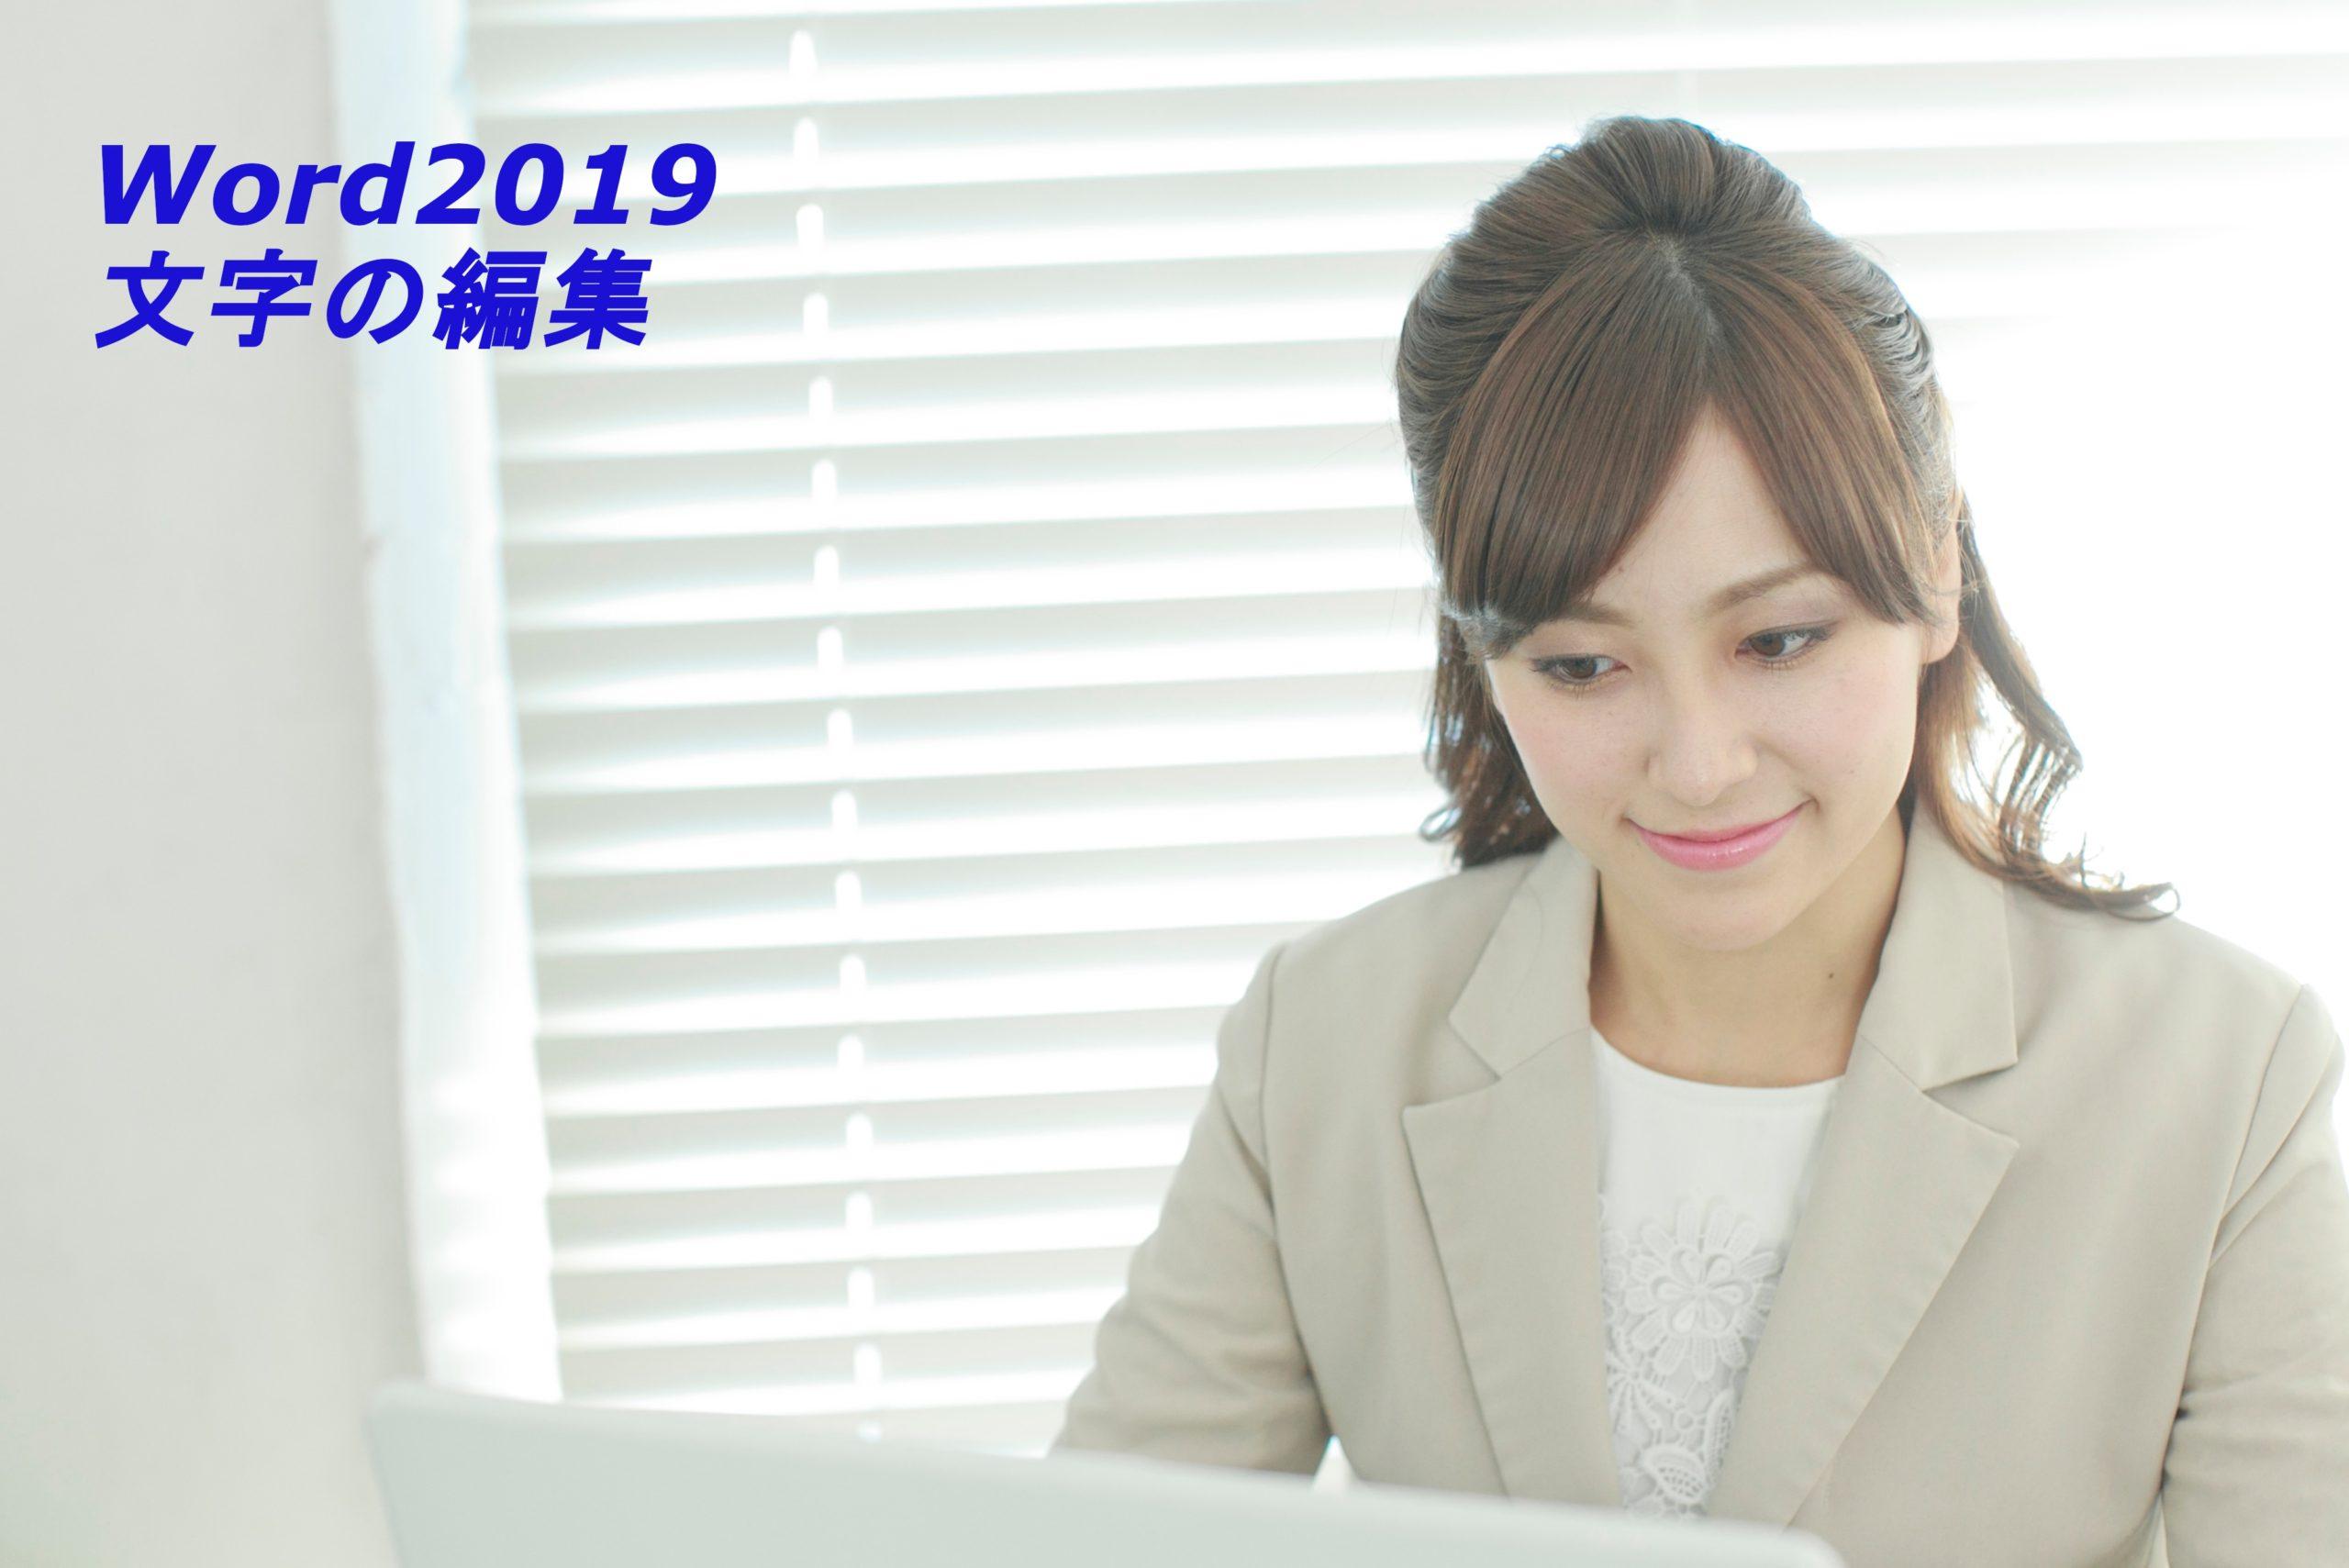 Word2019 文字の編集